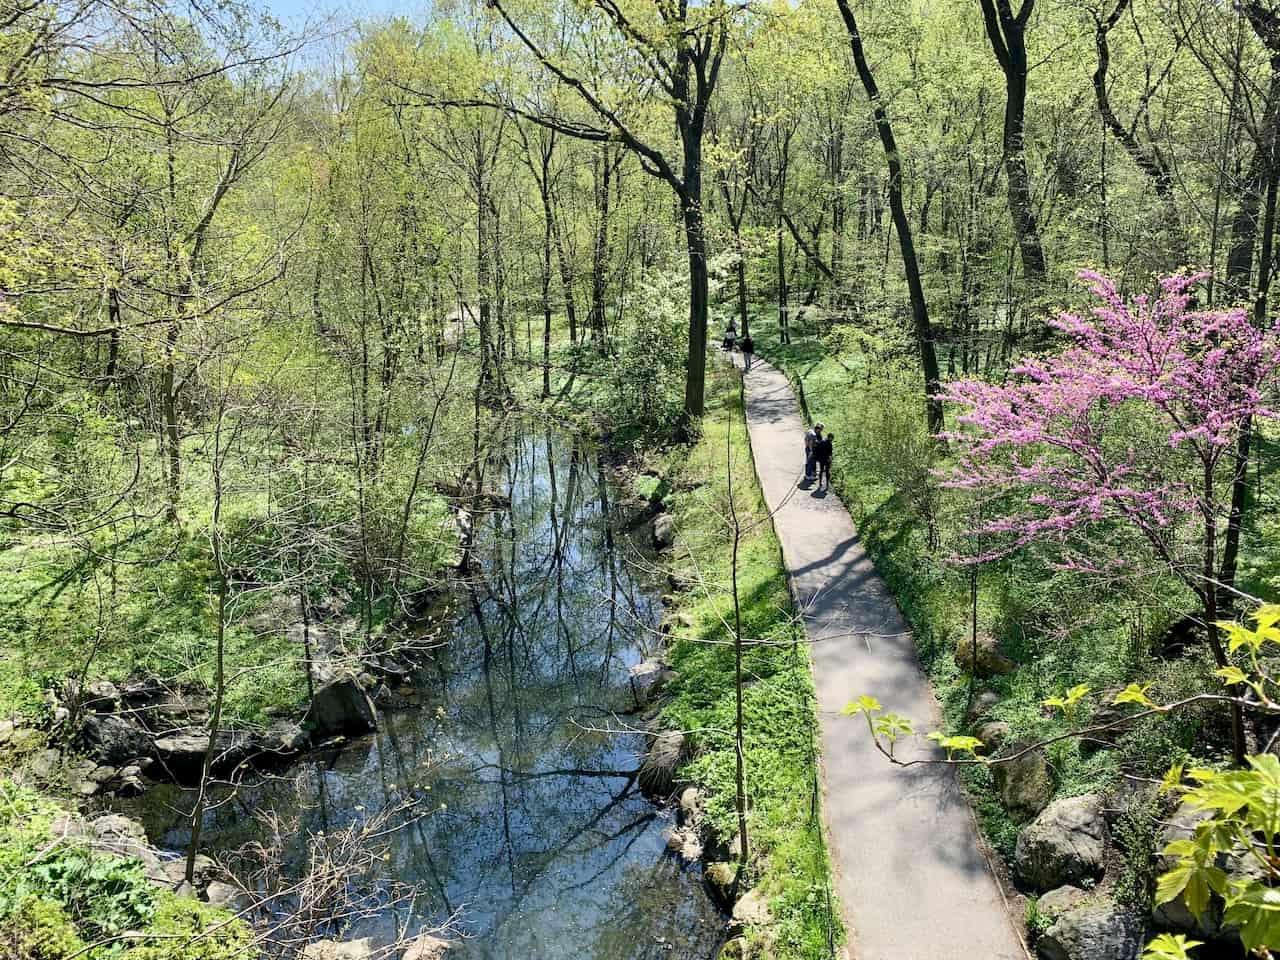 The Ravine Central Park